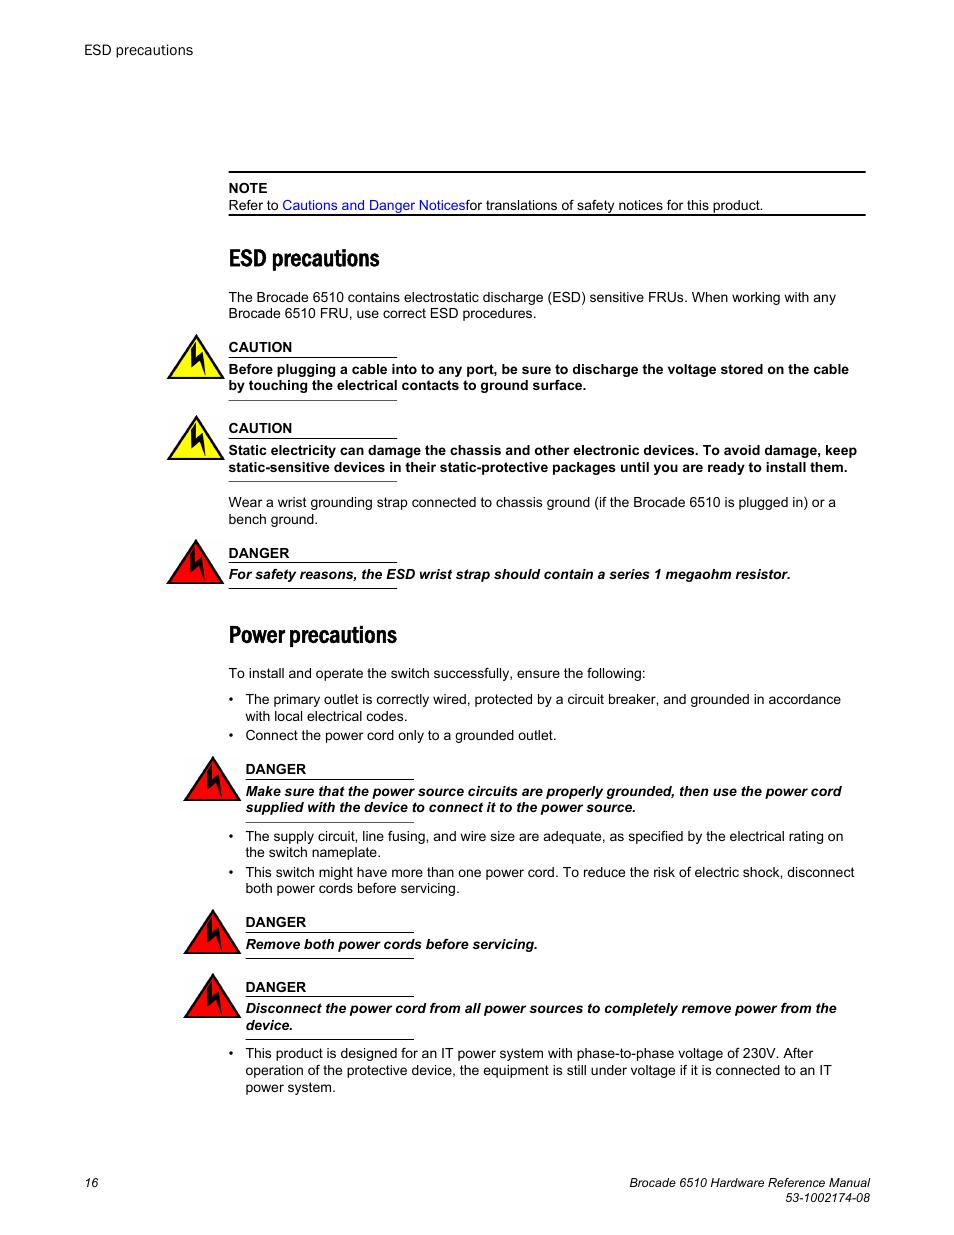 esd precautions power precautions esd precautions power rh manualsdir com PC Manual Reference gnu make reference manual